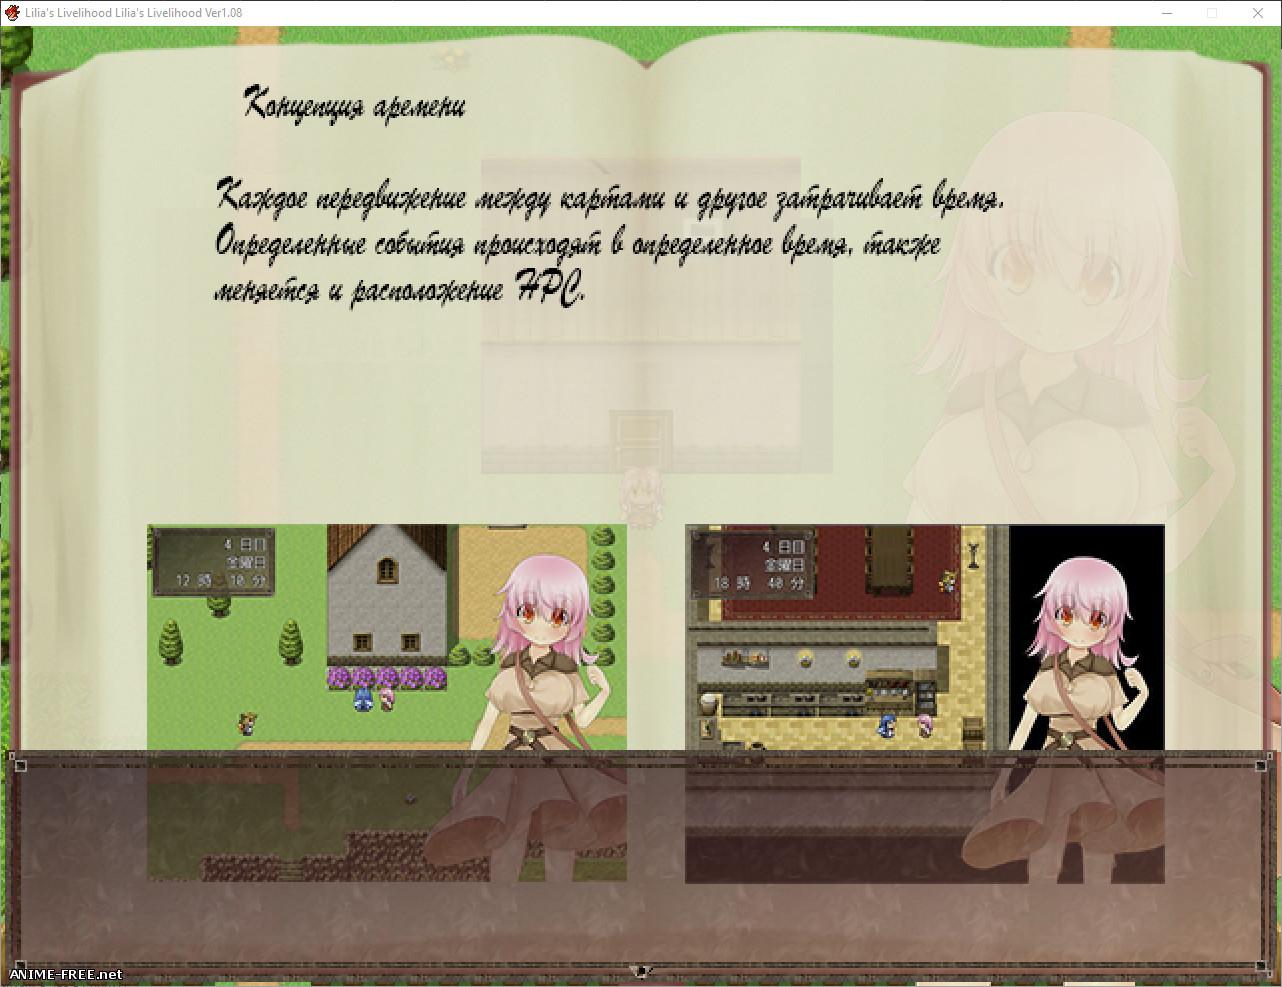 Lilia's Livelihood ~Girl, Tentacle and the Wonder Island~ [2017] [Cen] [jRPG] [JAP,RUS] H-Game